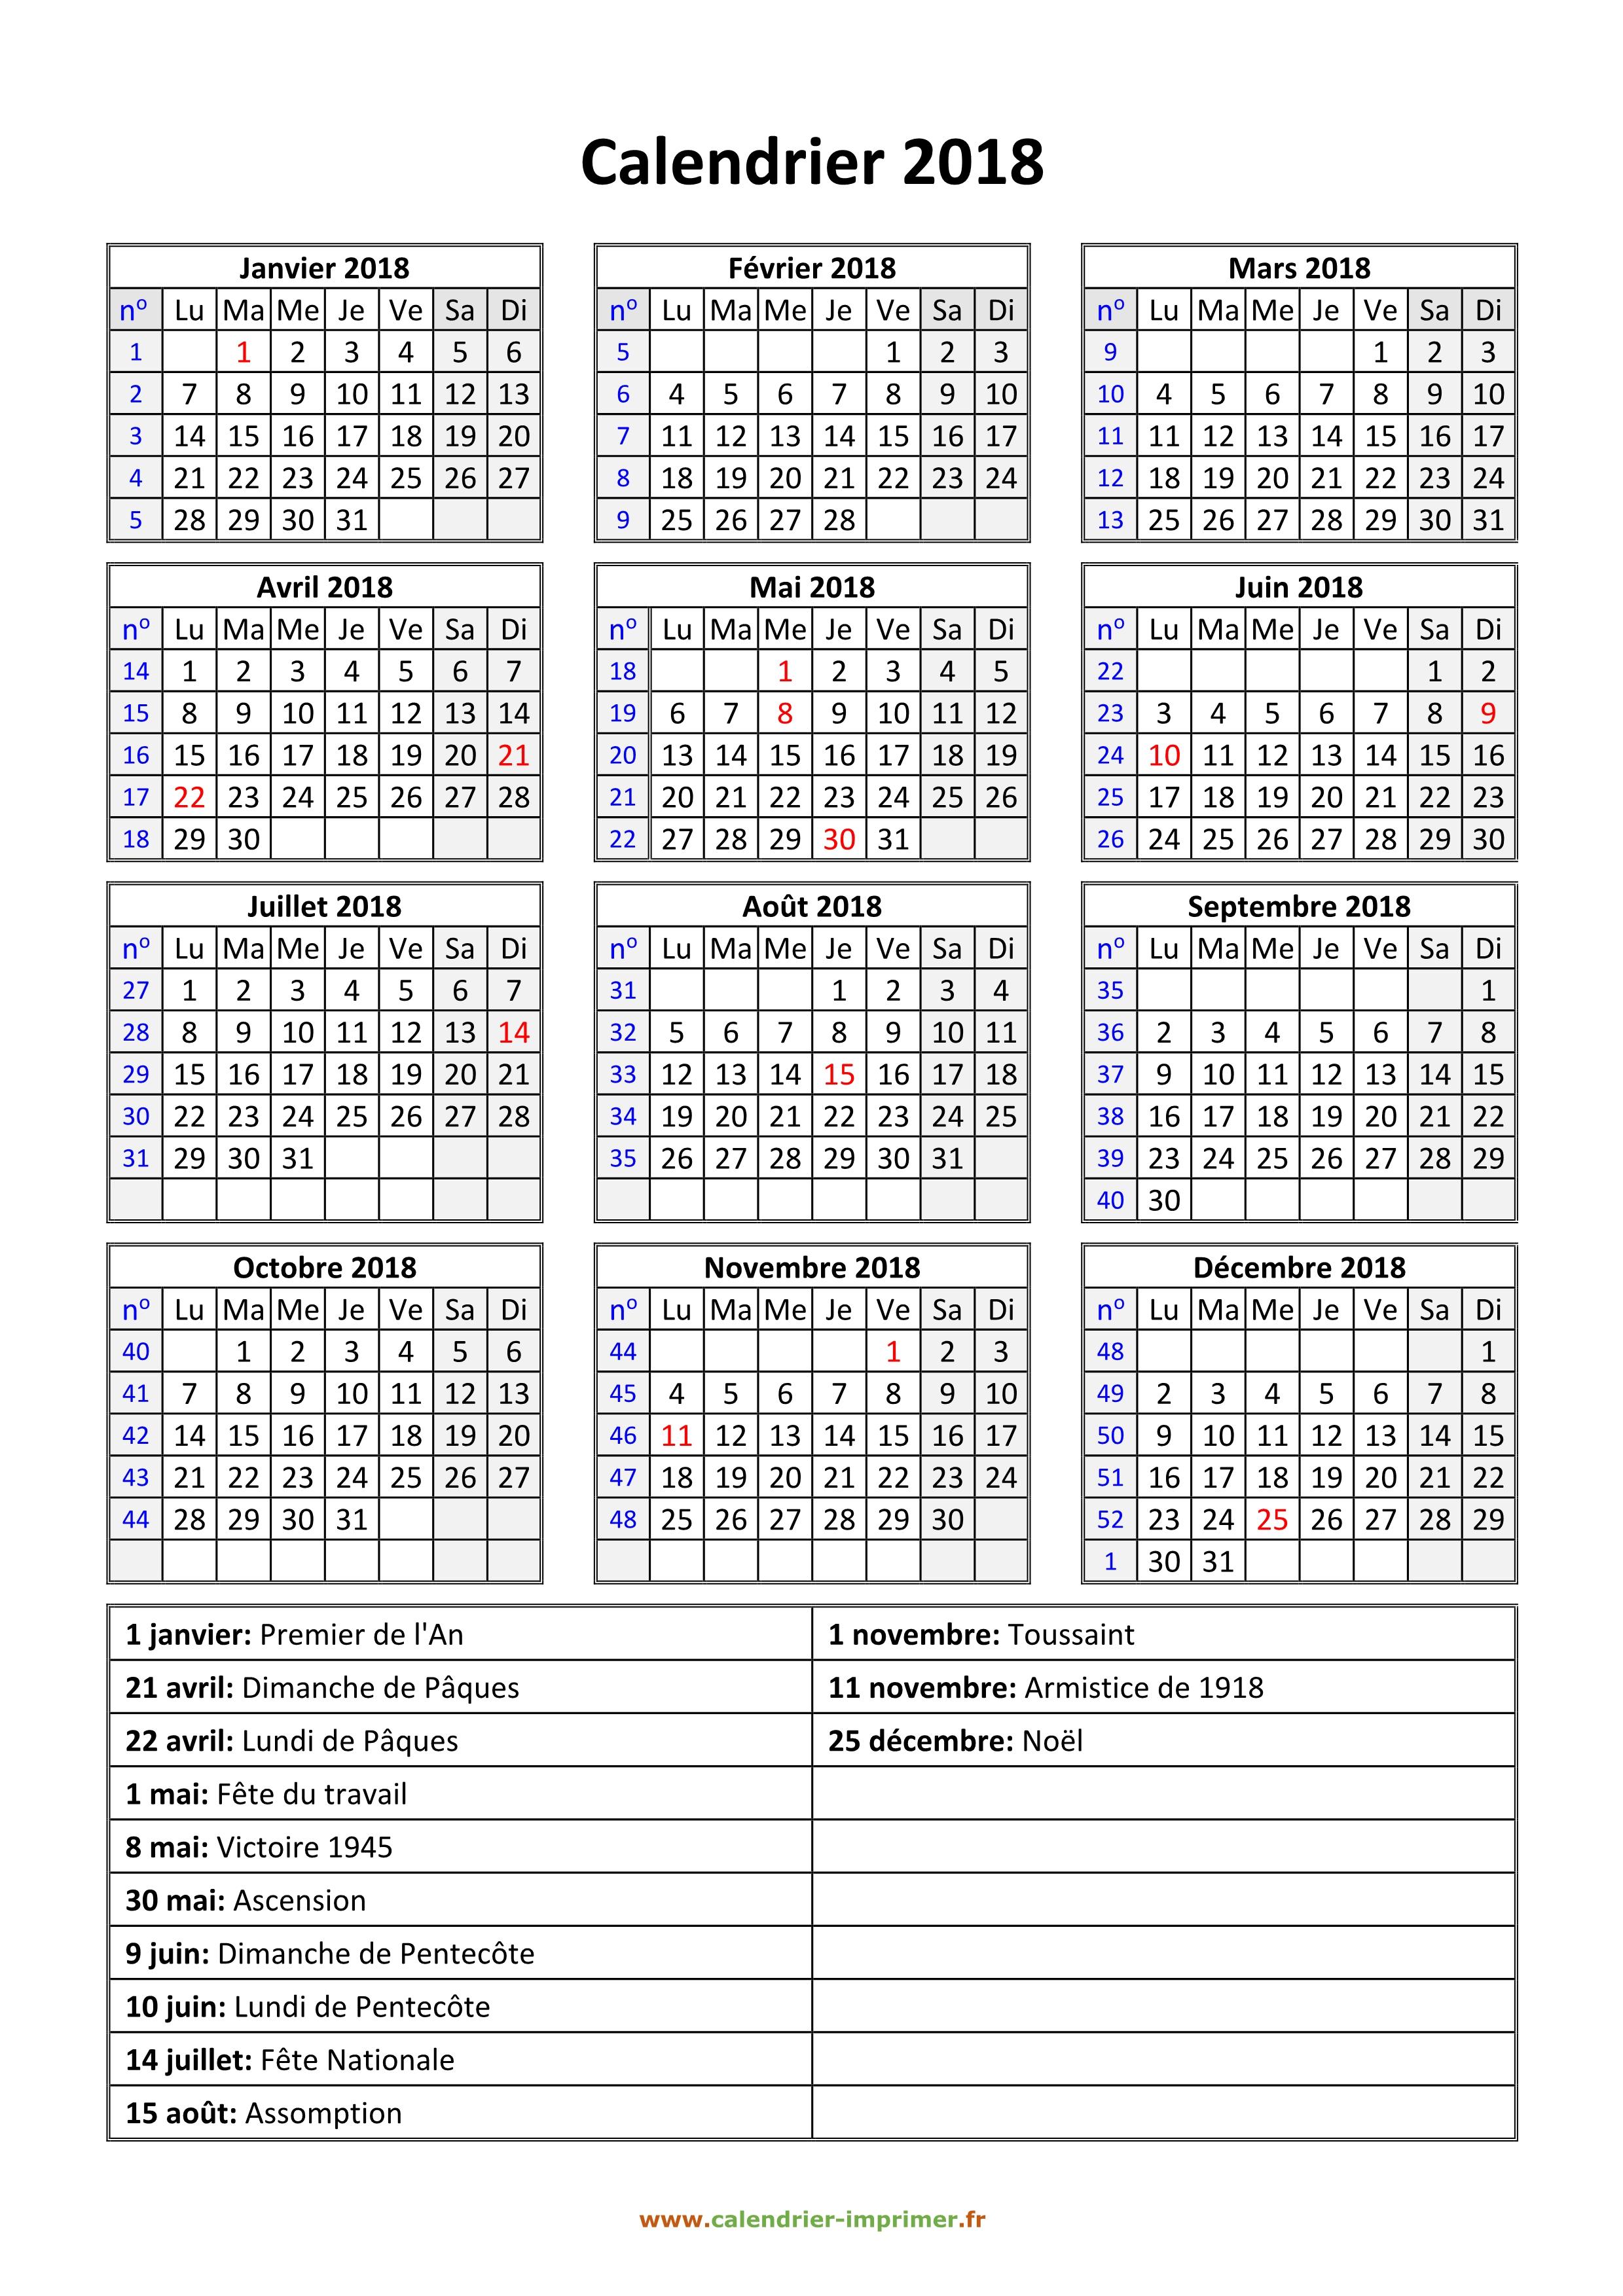 Calendrier 2019 Semestre 1.Calendrier 2019 A Imprimer Gratuit